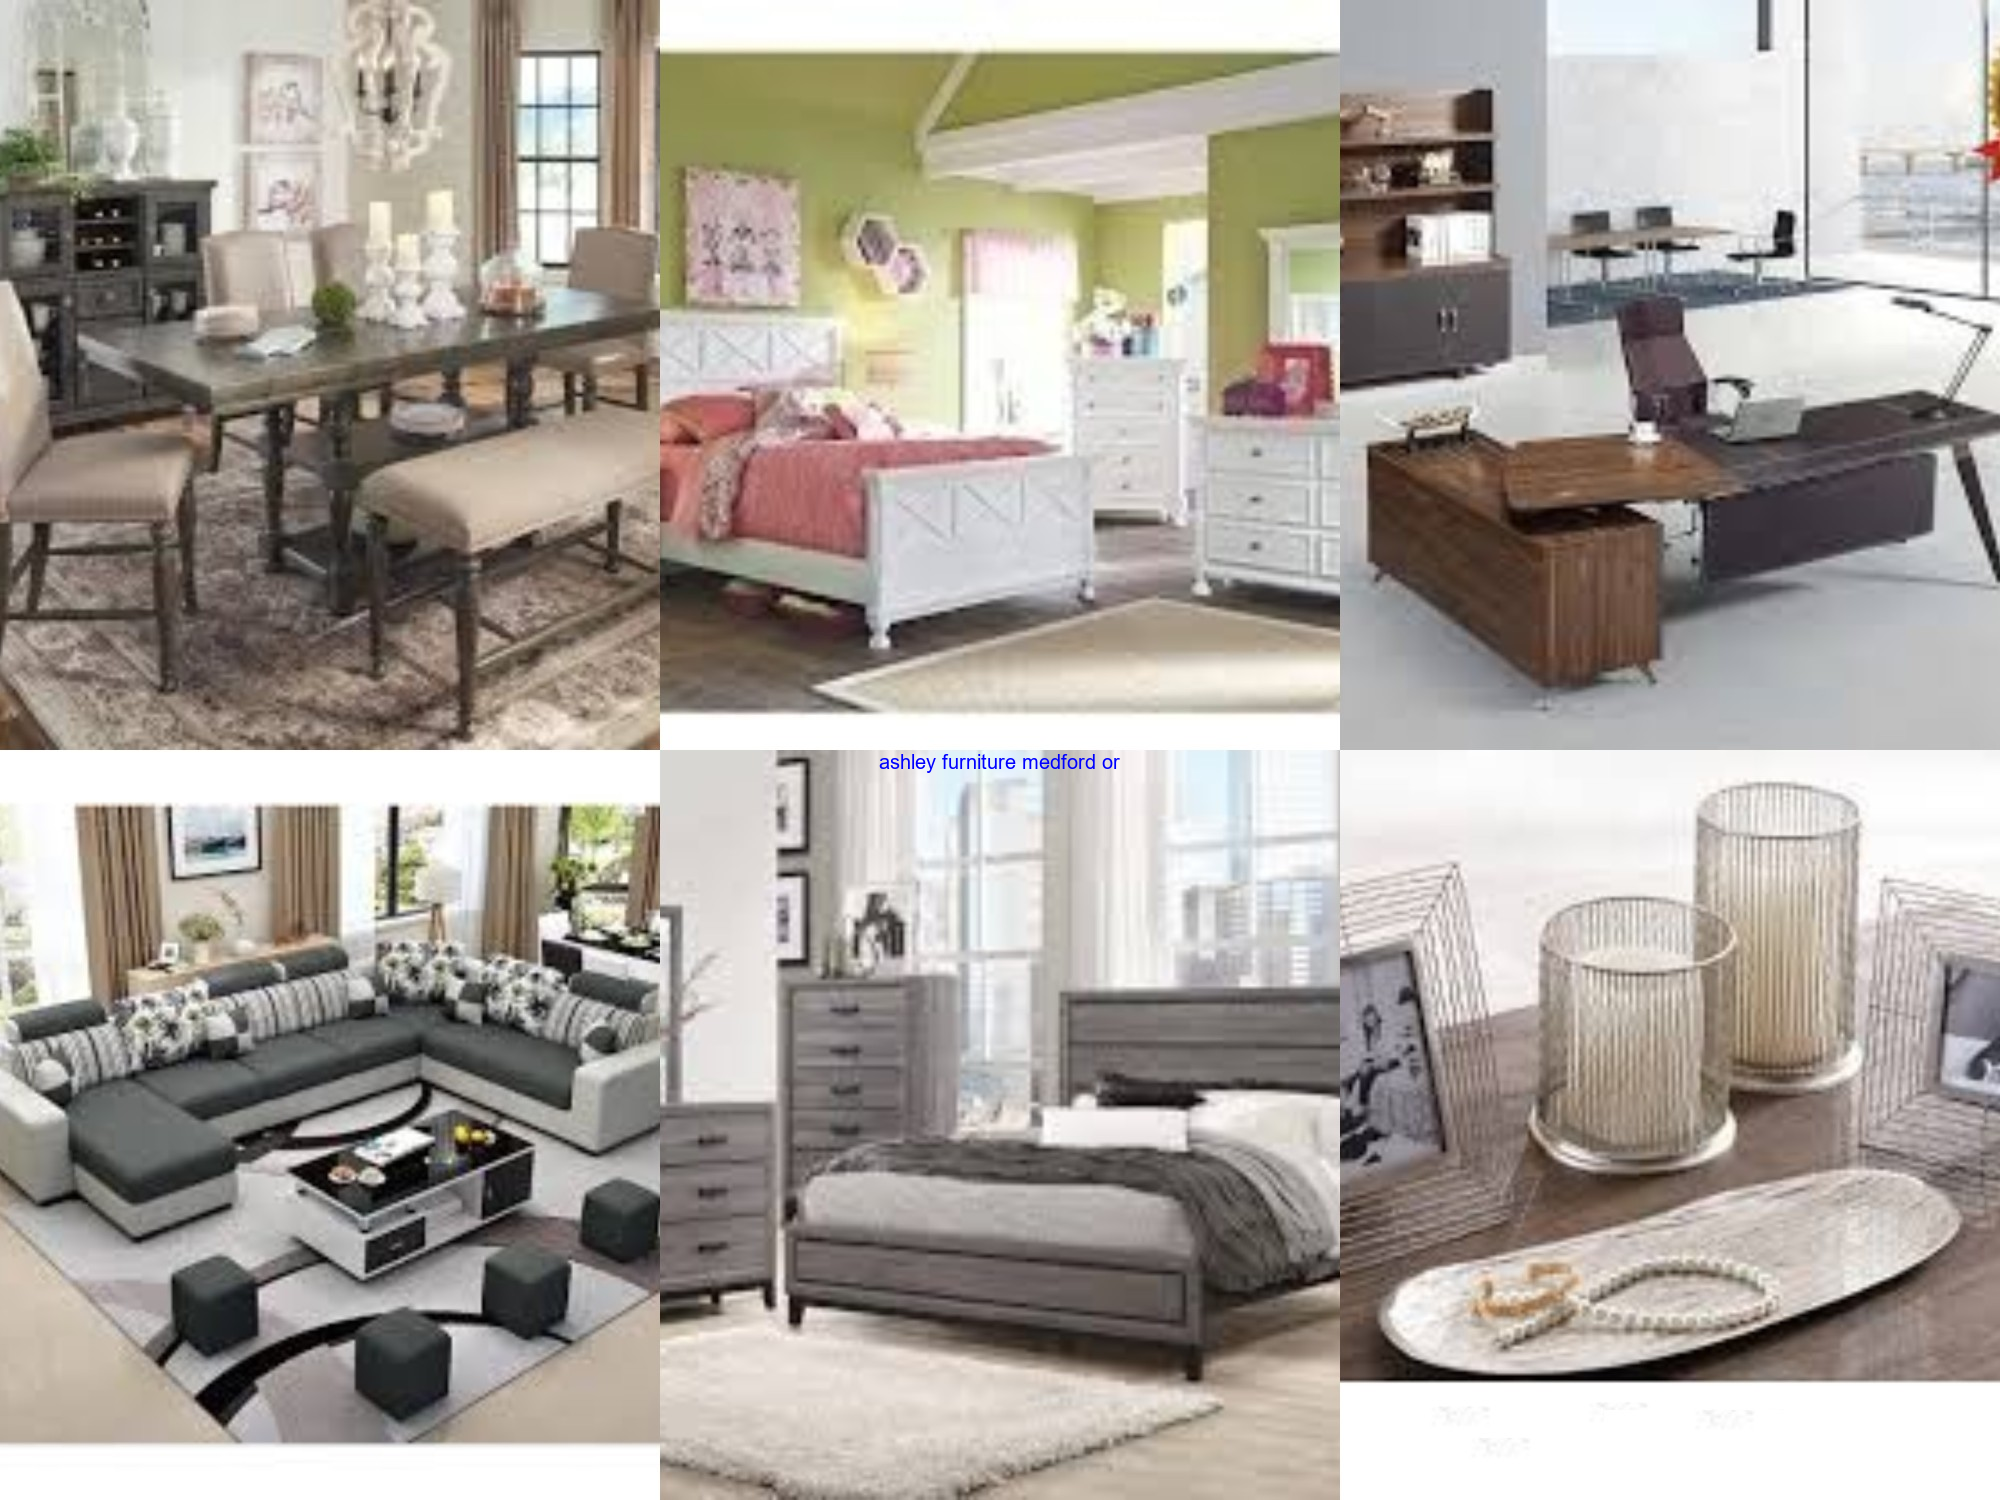 Ashley Furniture Medford Or I Would